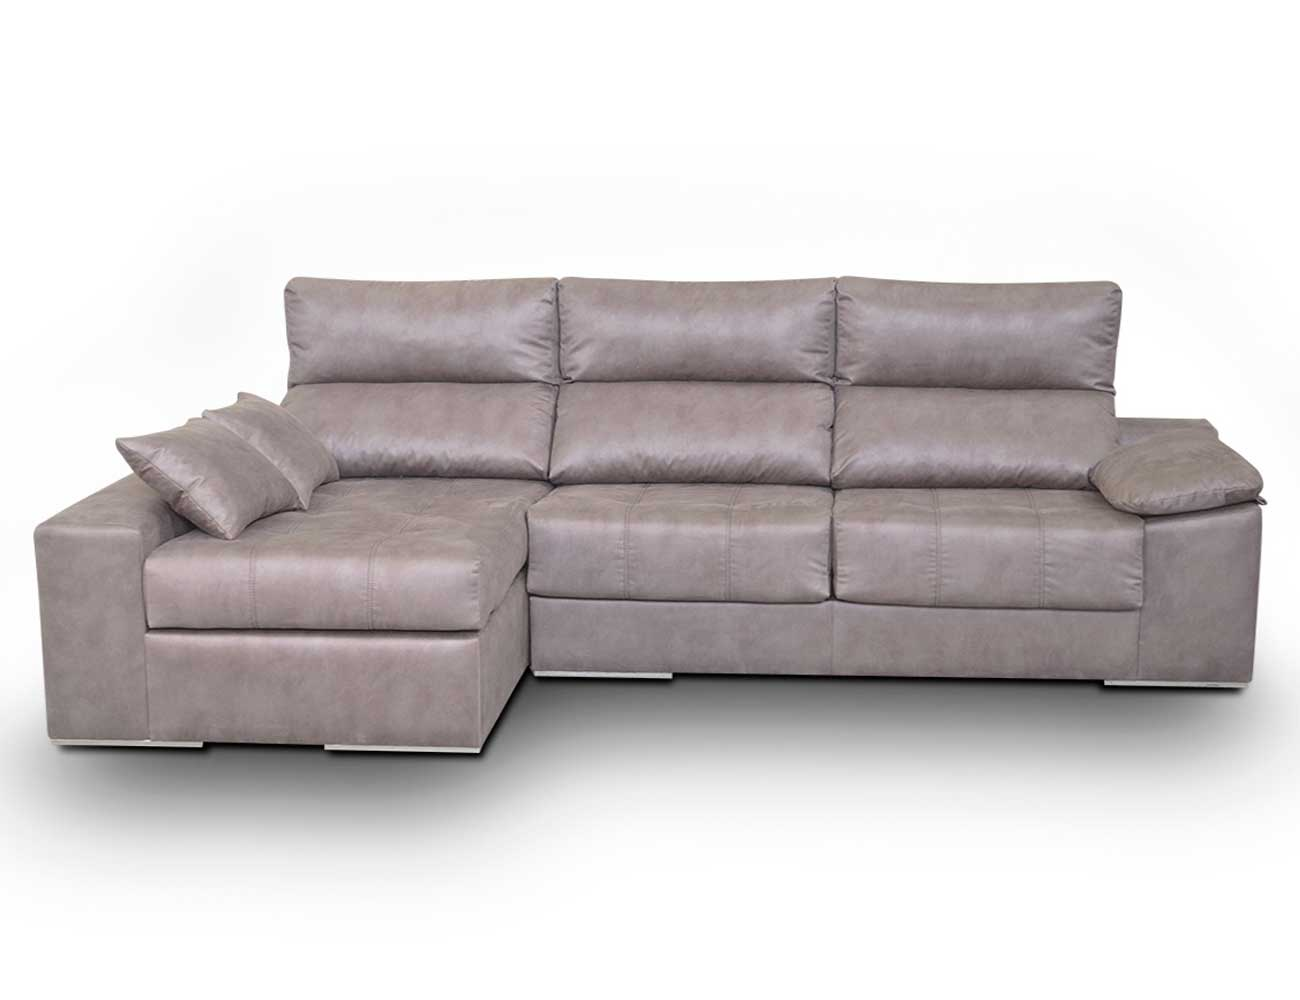 4938_sofa chaiselongue moderno asientos extraibles muy comodo dobles pespuntes donatella3